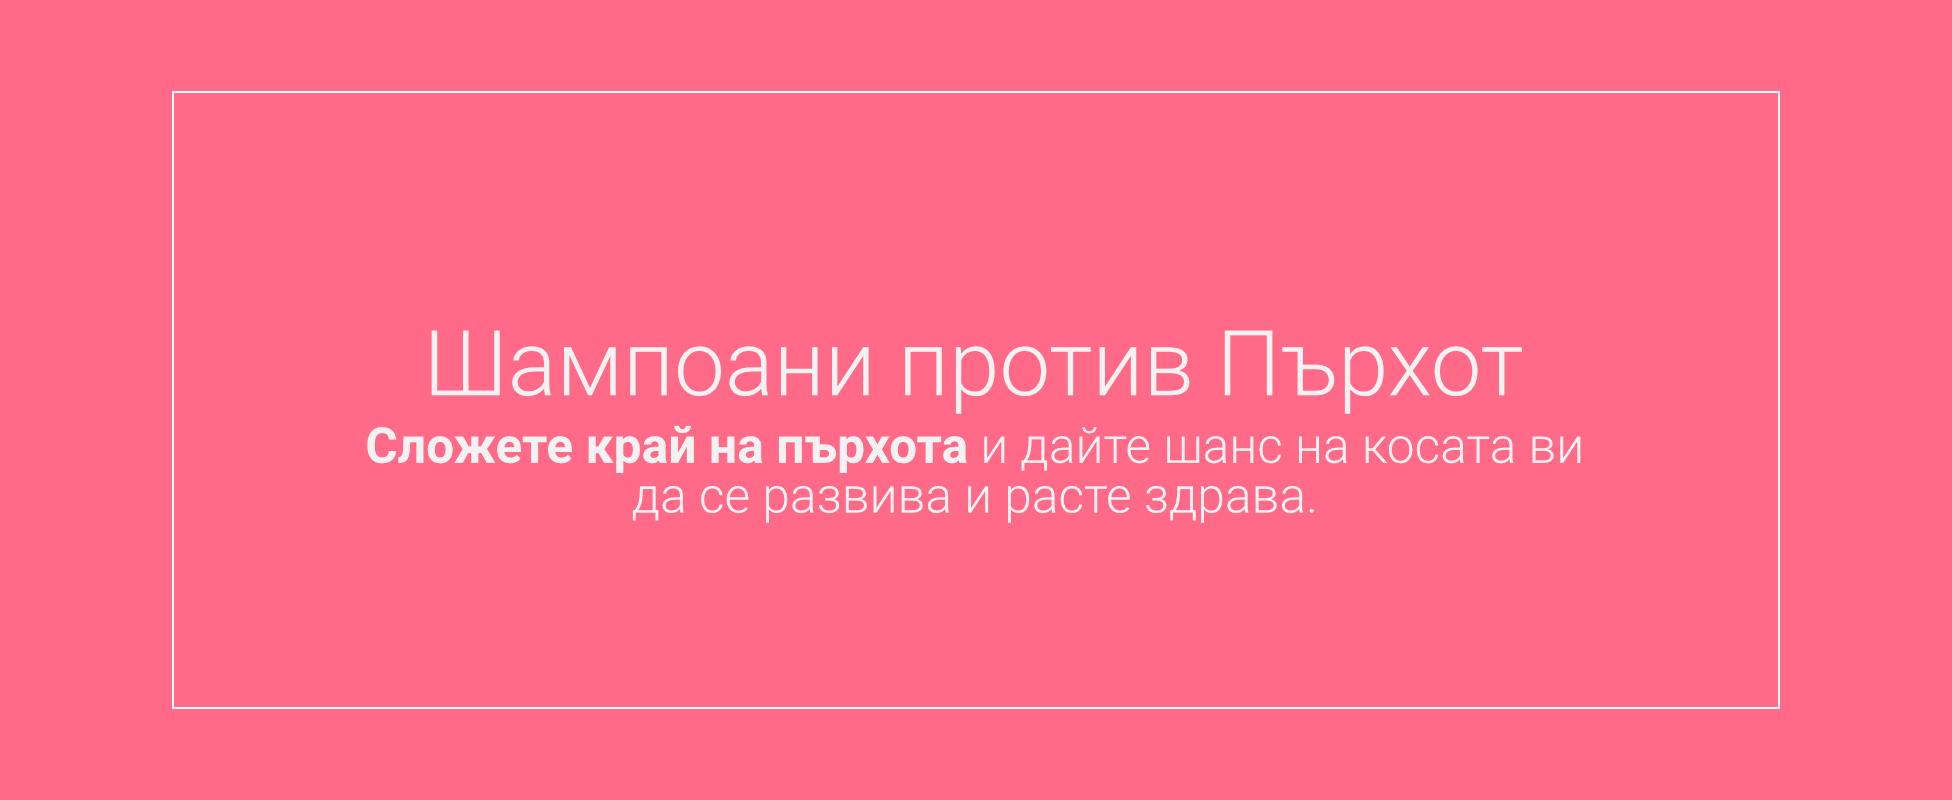 shampoani-protiv-parhot